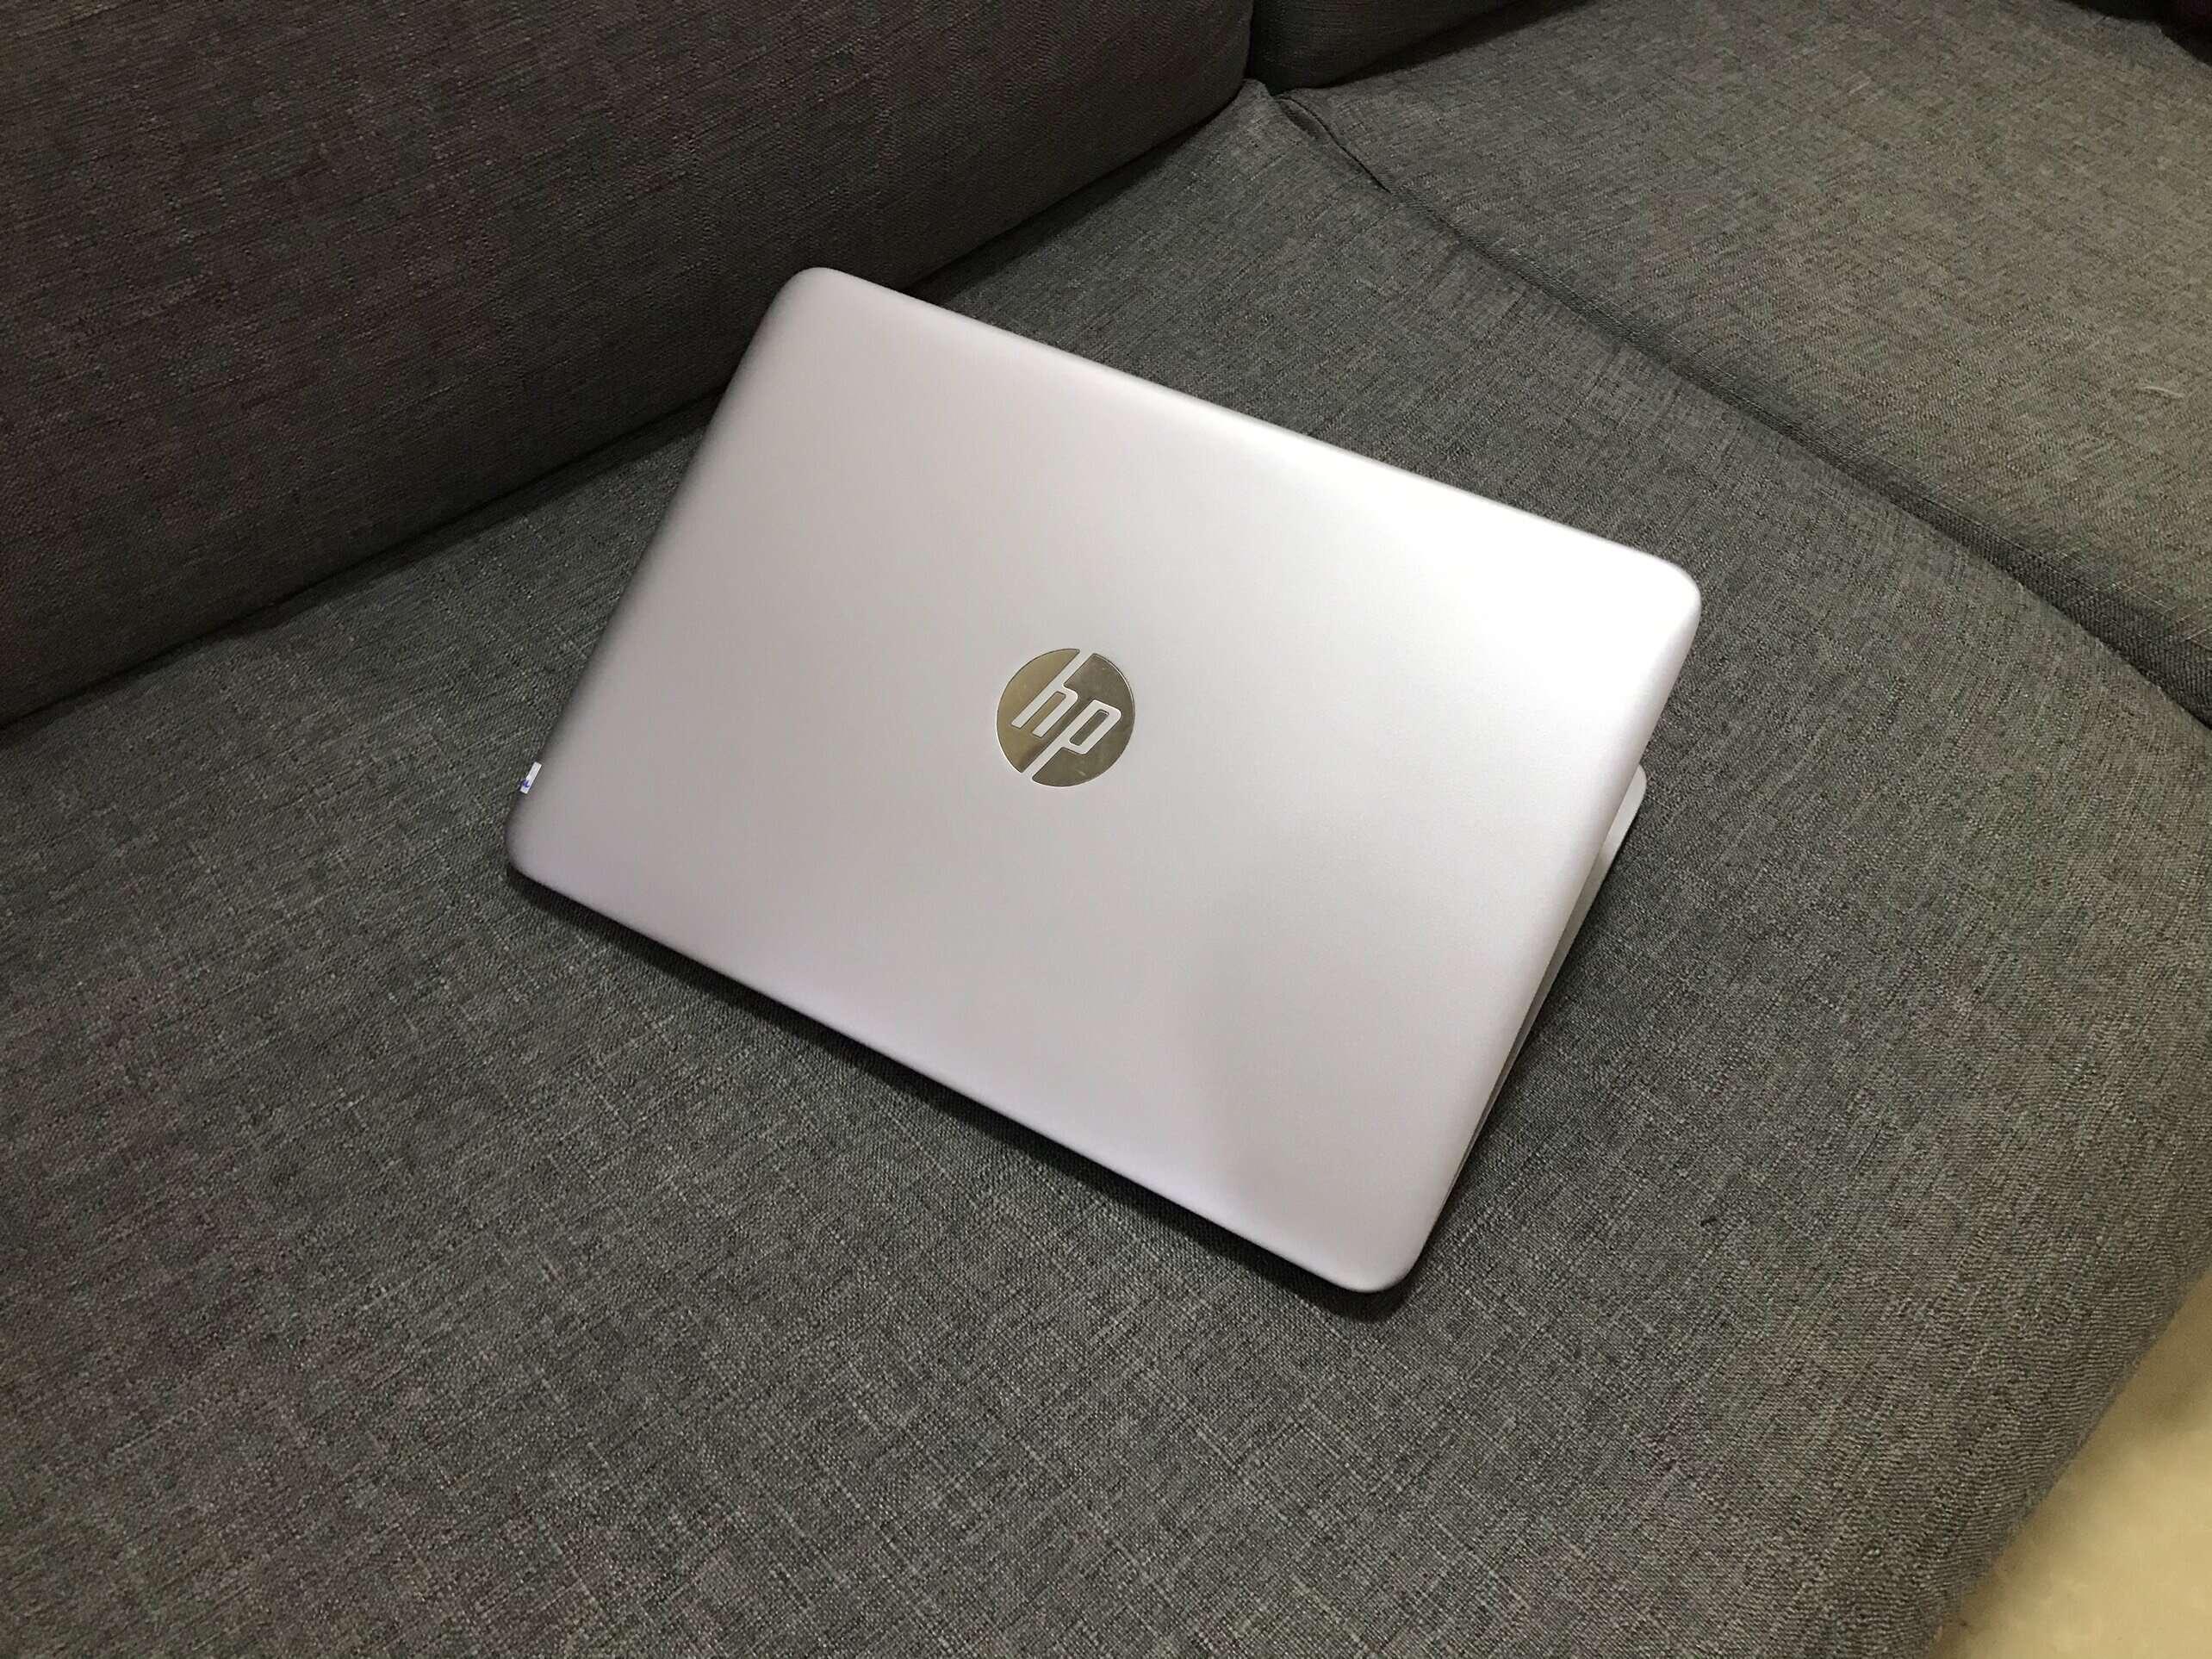 HP Elitebook 820 g3 i7 6600u/ 8GB RAM/ SSD 256GB/ 12,5 inch/  Win 10